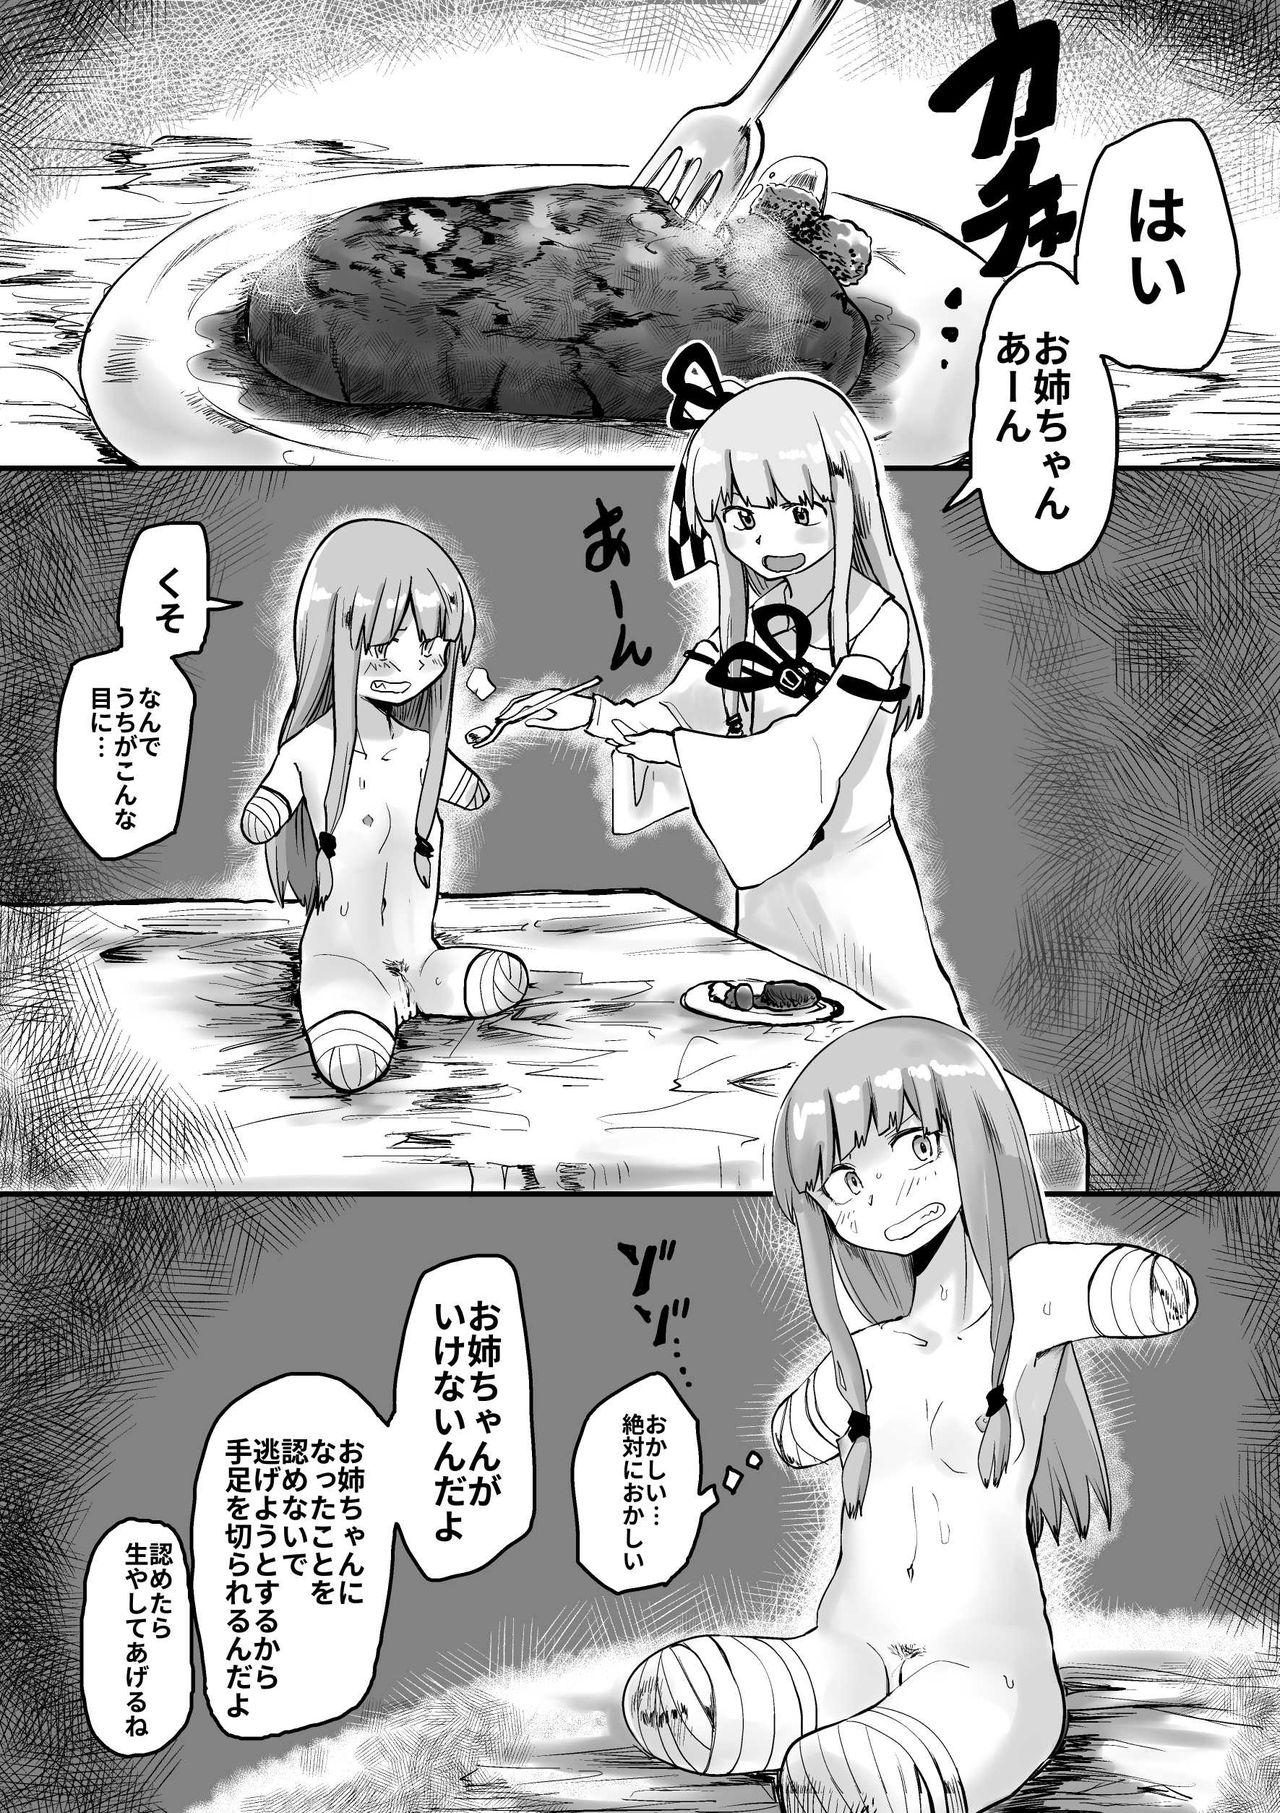 Akane-chan TS Manga 4